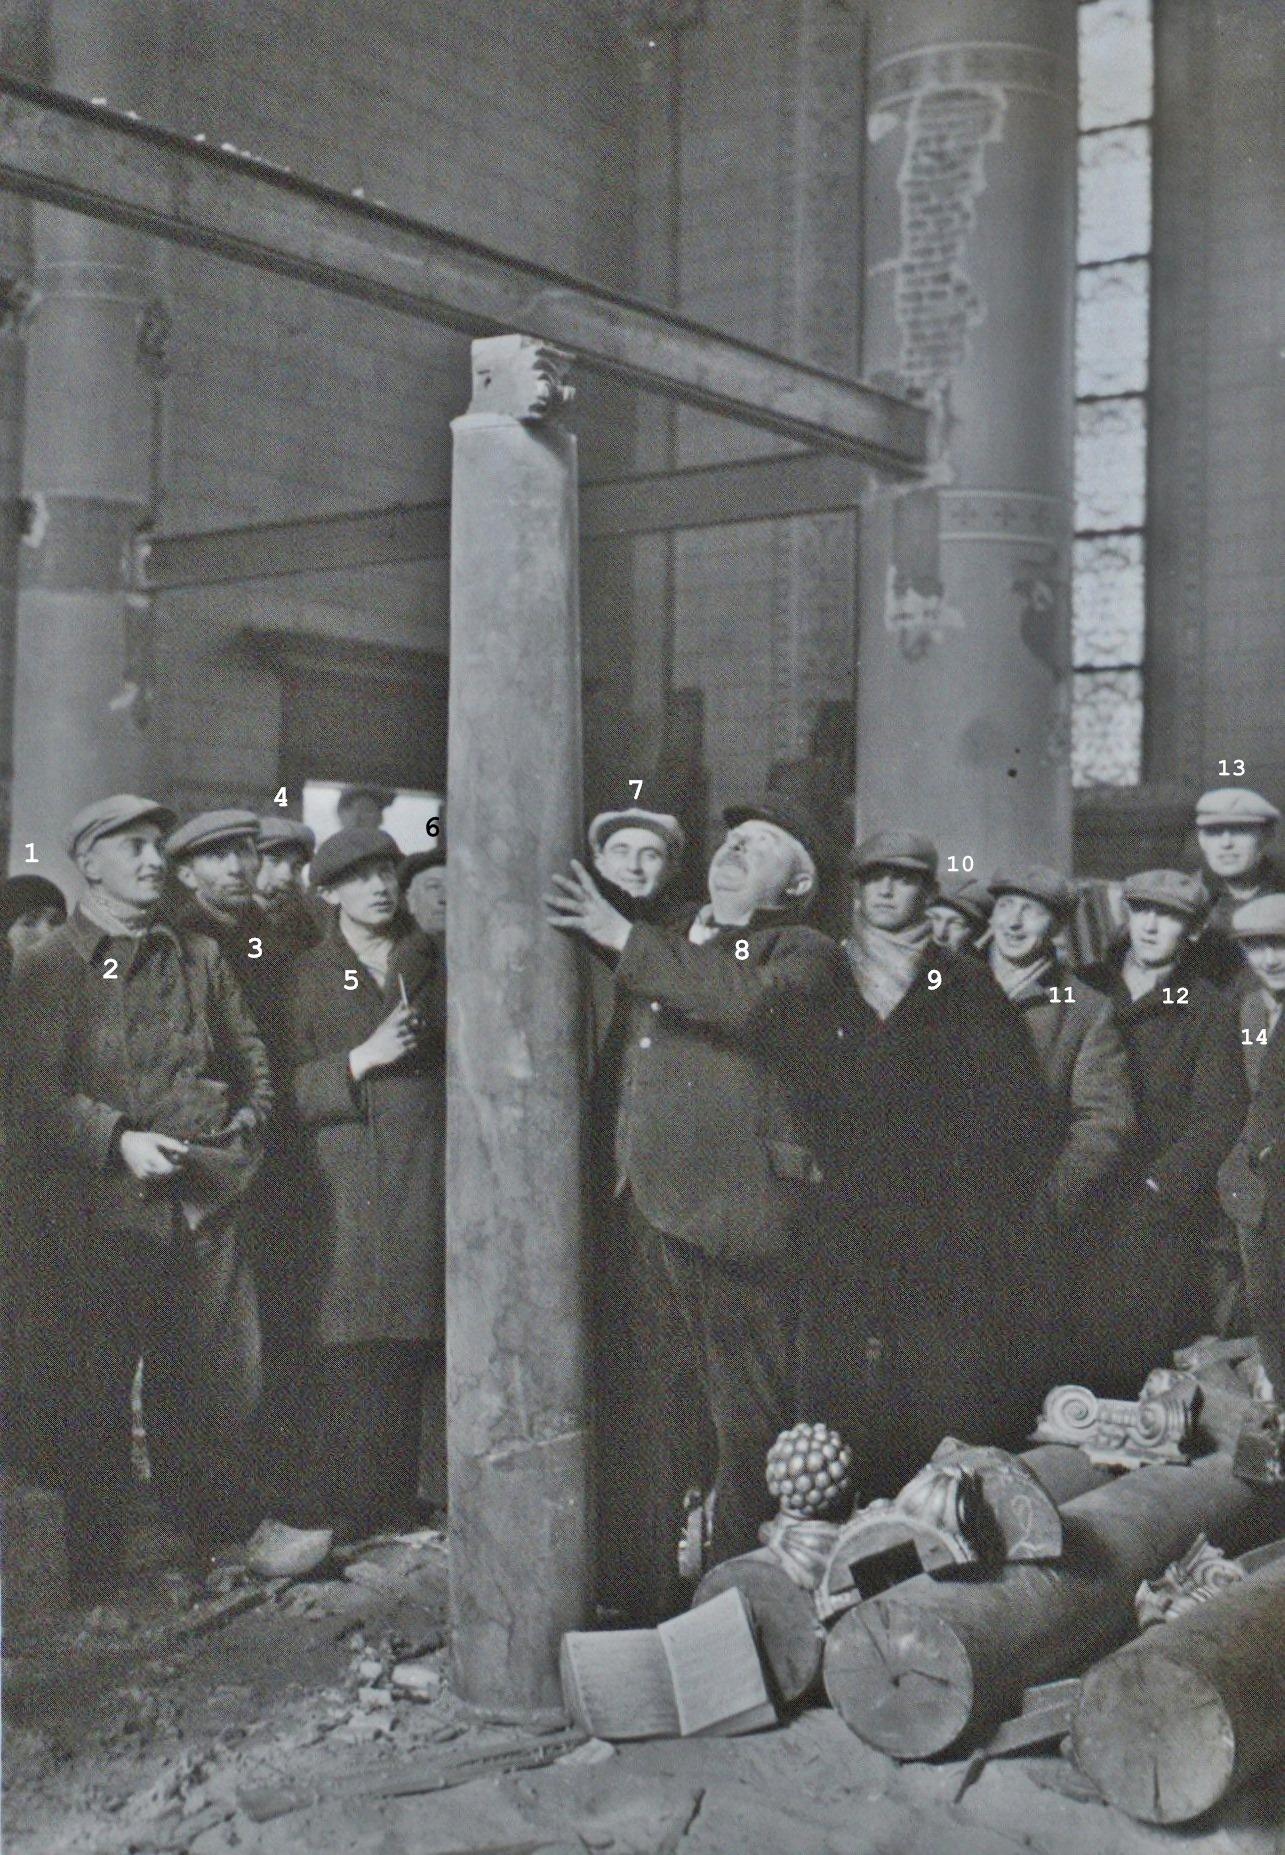 1932 Sloop en verkoop materialen oude kerk maart 1932